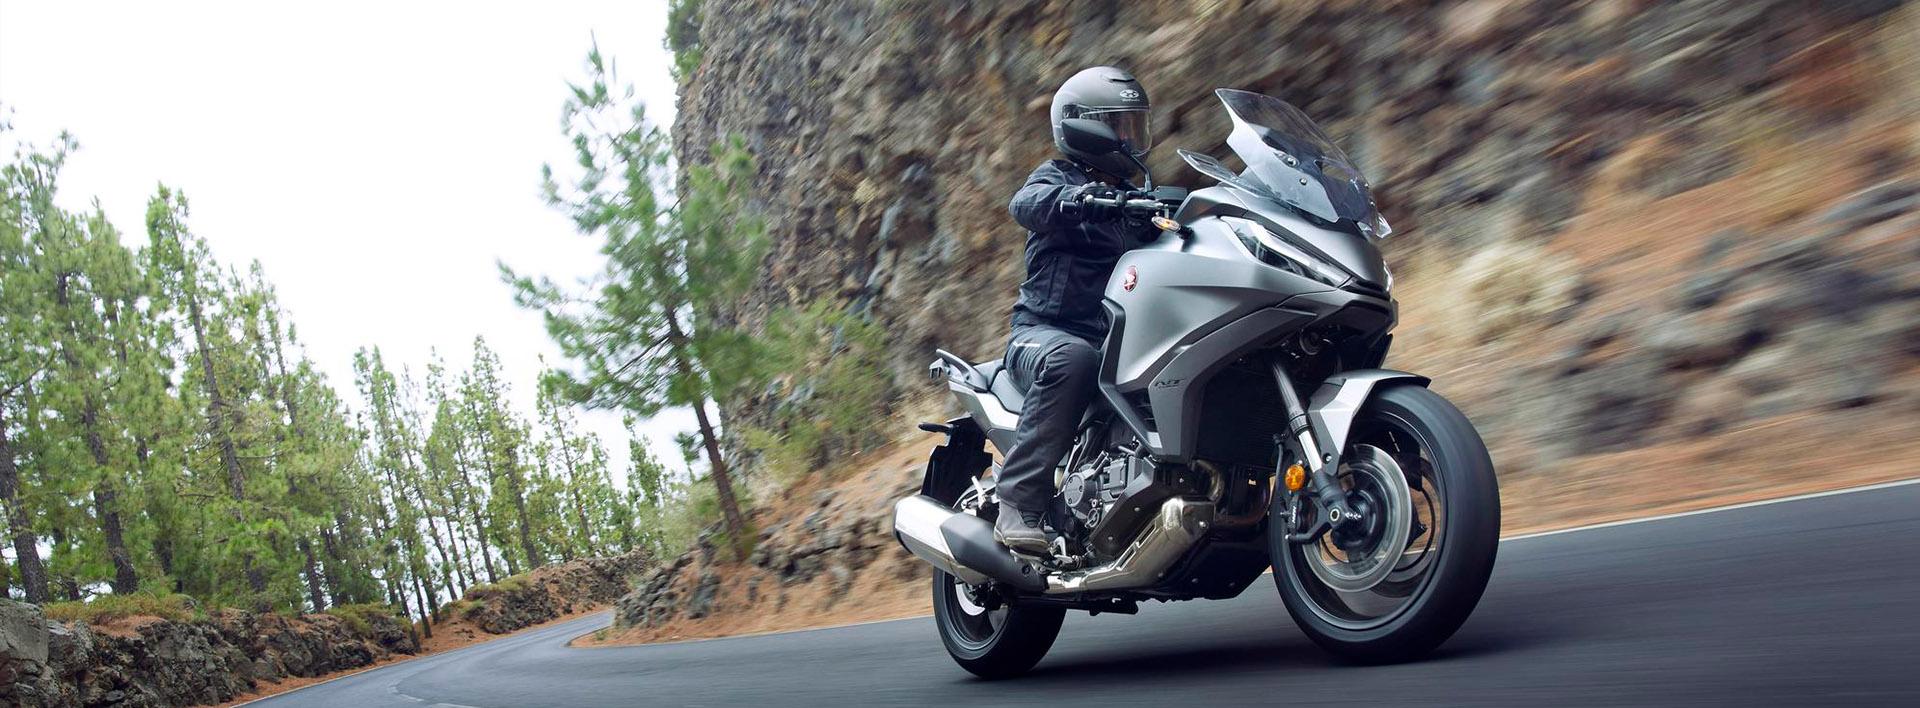 Honda New Motorcycle Range